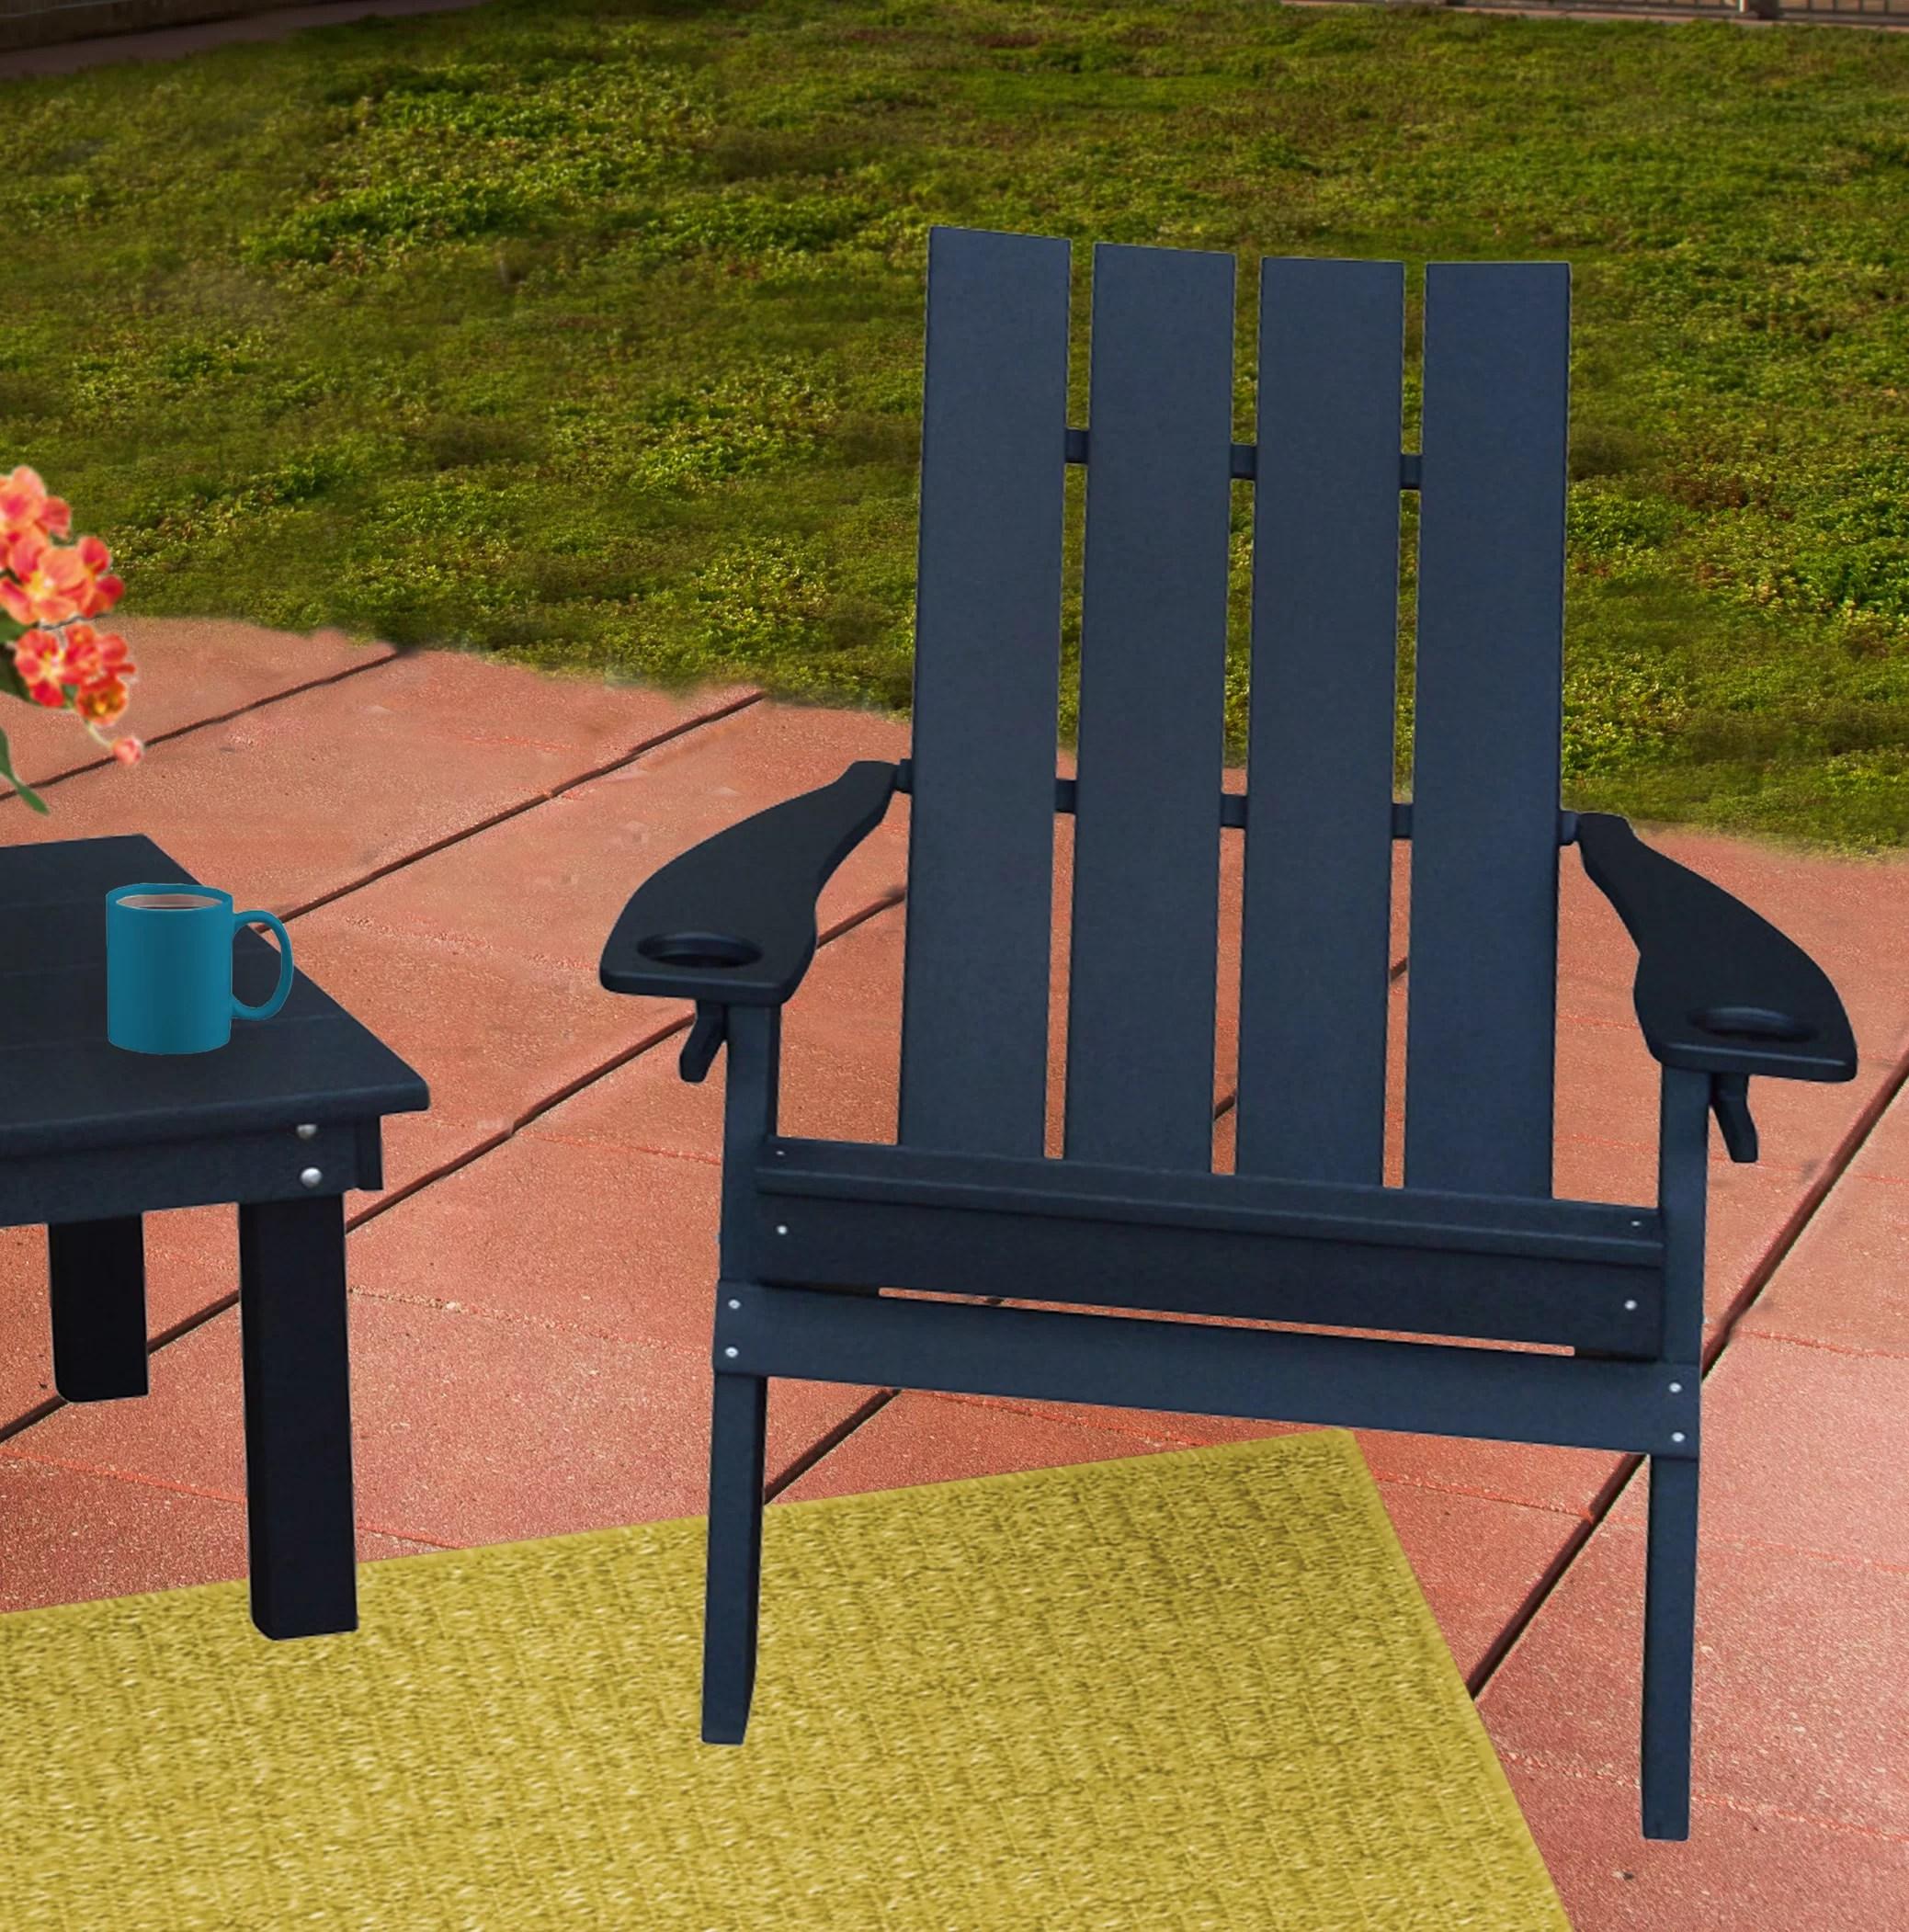 Koenig Cupholders Plastic Folding Adirondack Chair